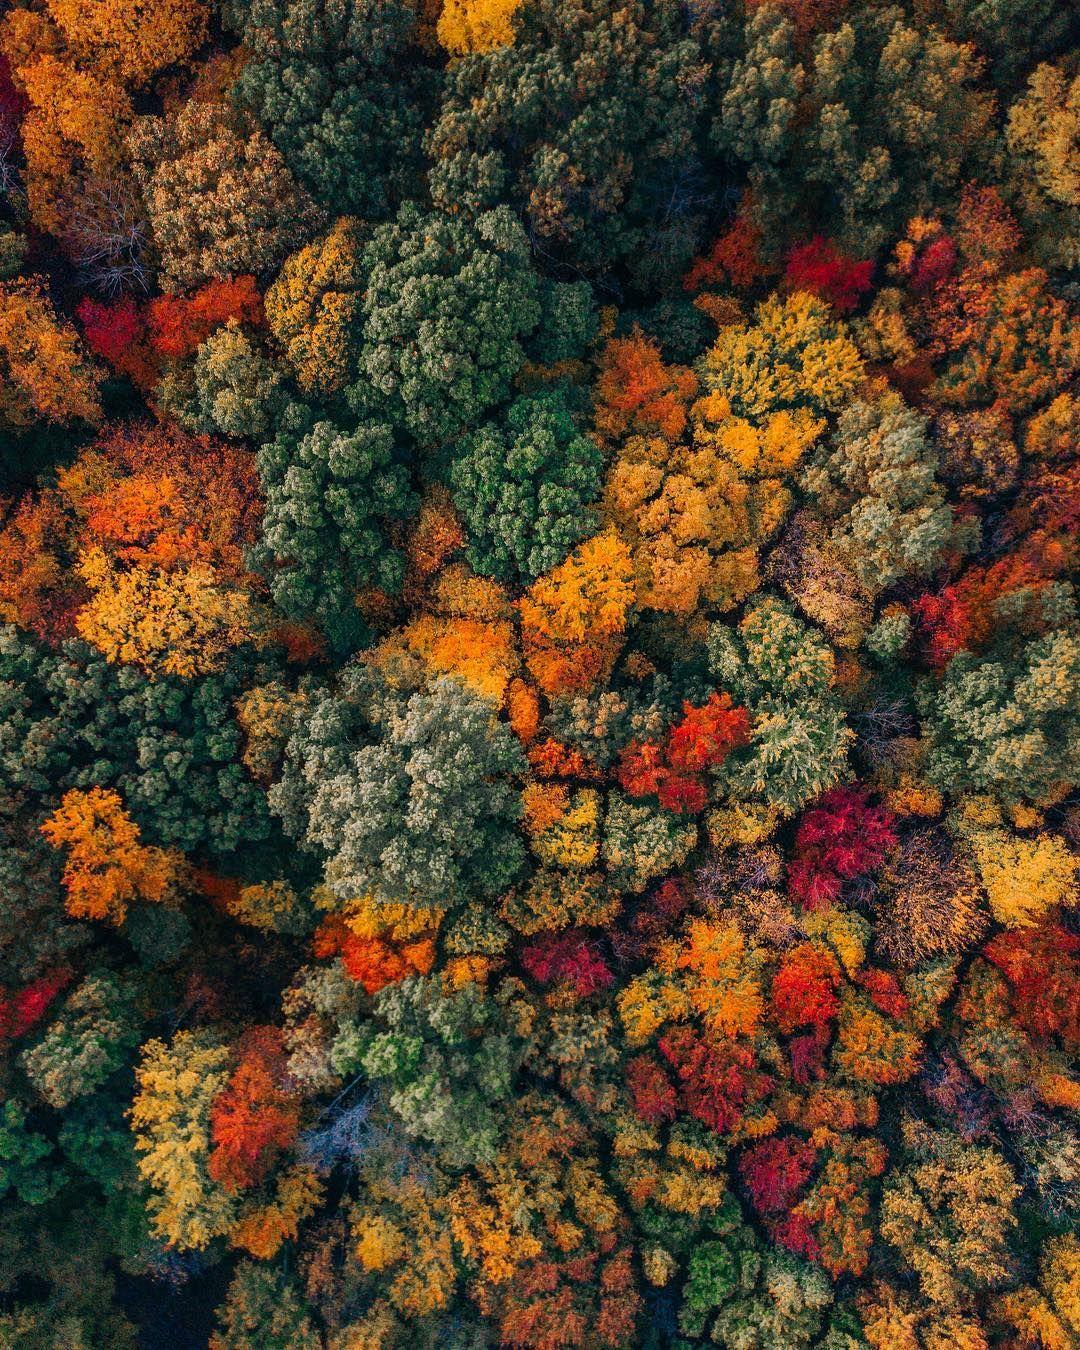 Striking Drone Photography By Martin Sanchez